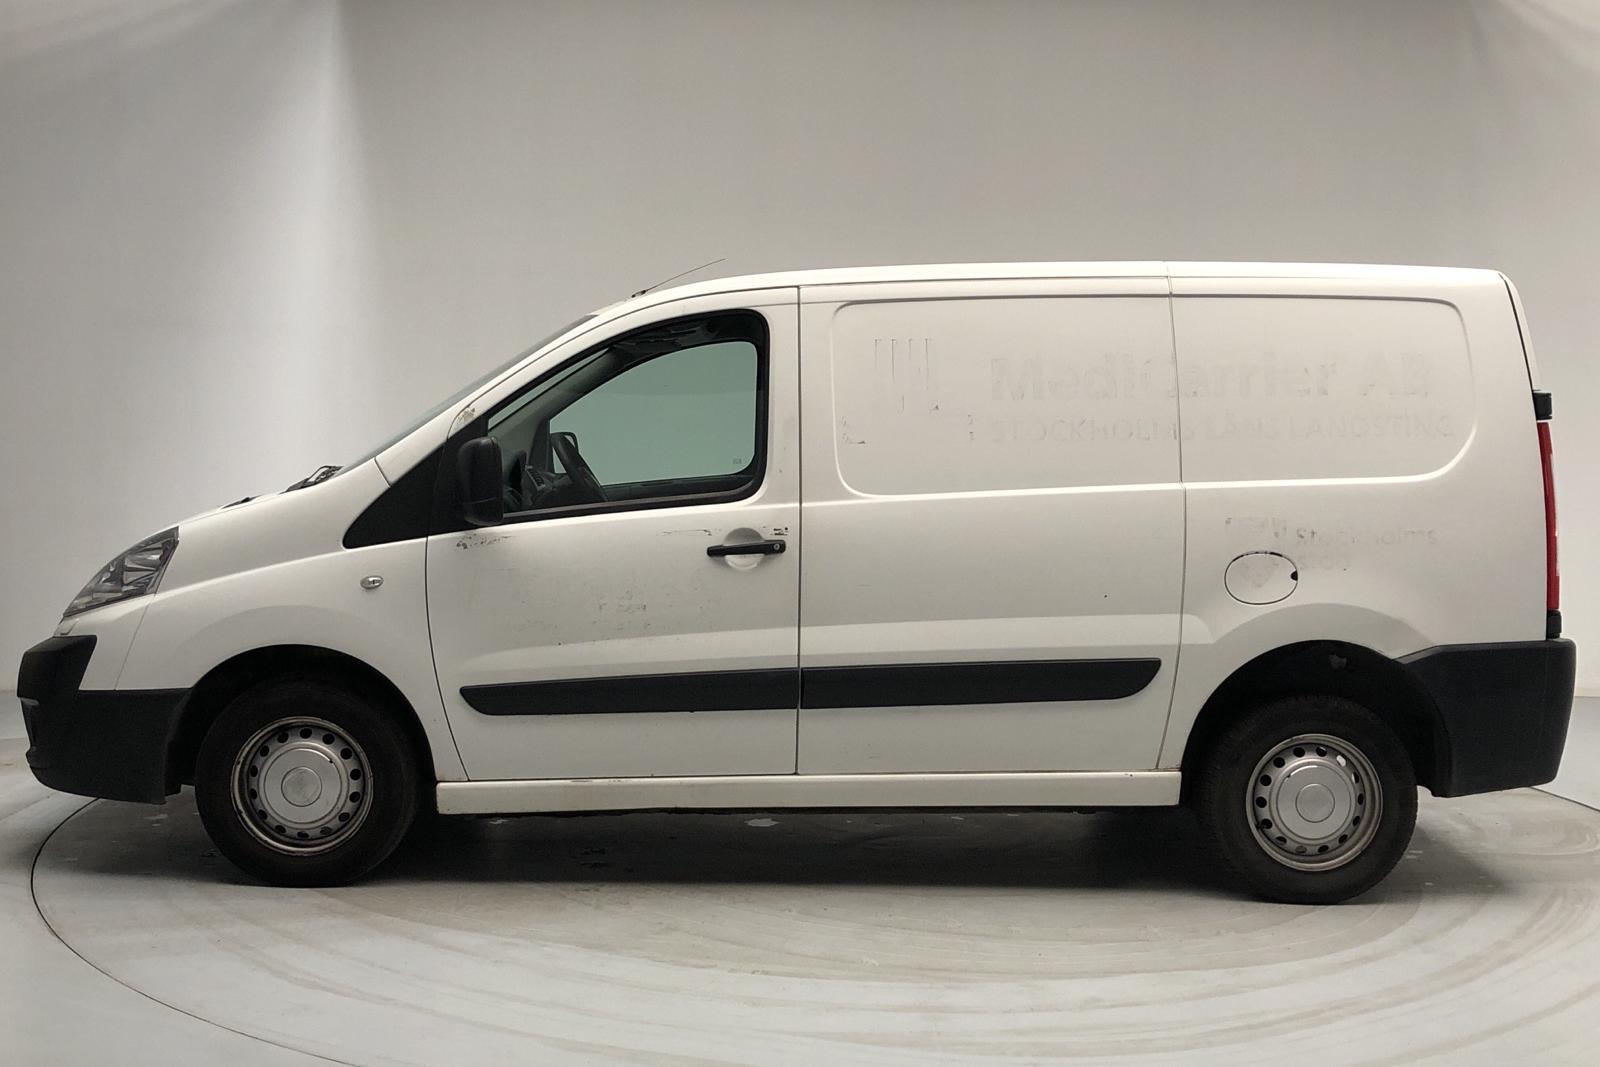 Fiat Scudo 1.6 MJT (90hk) - 291 120 km - Manual - white - 2014